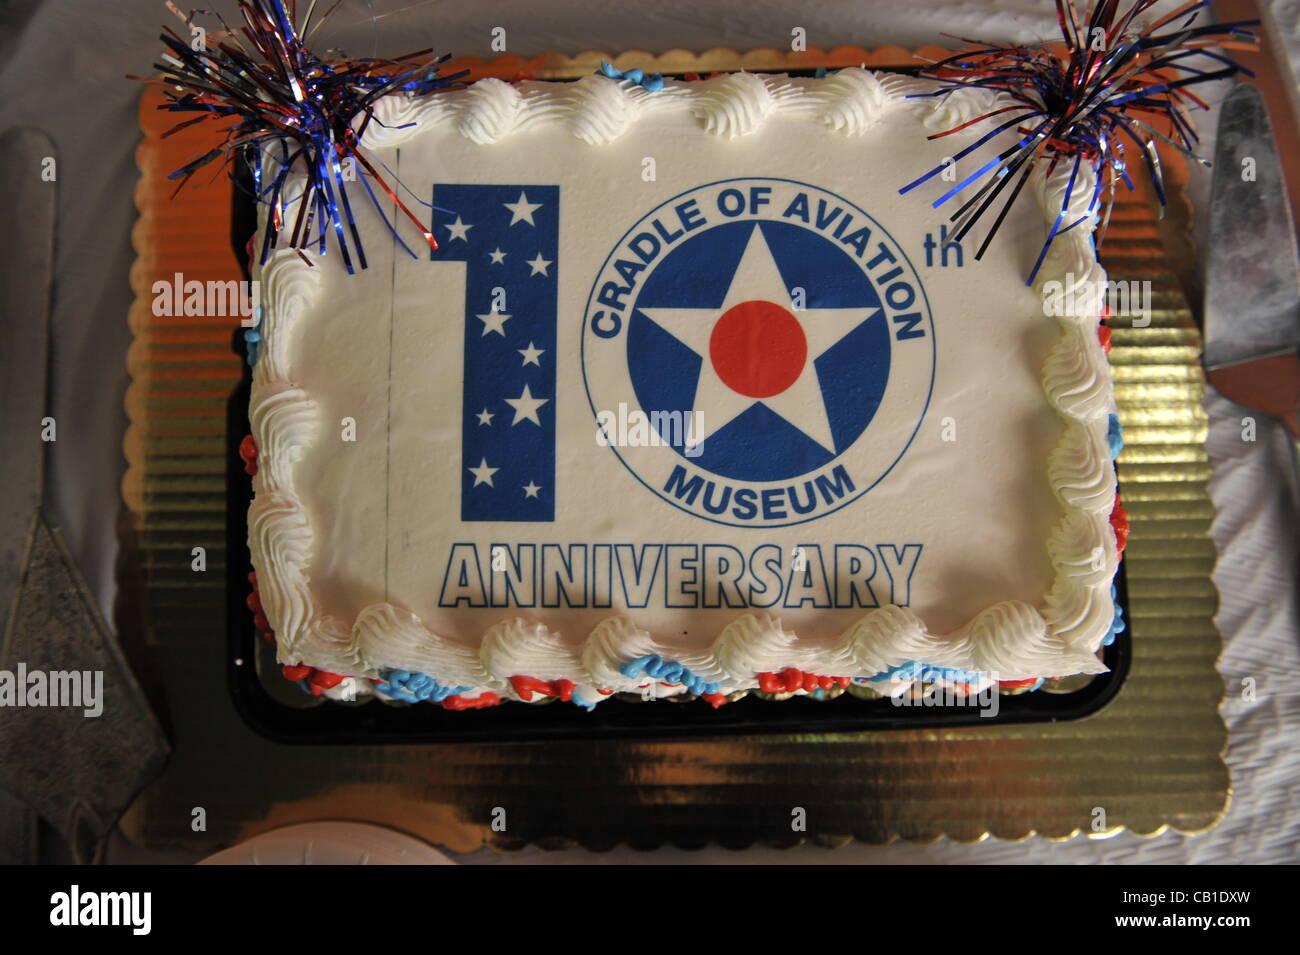 Cake celebrating 10th anniversary celebration of Cradle of Aviation Museum, on Saturday May 19, 2012, Long Island, - Stock Image